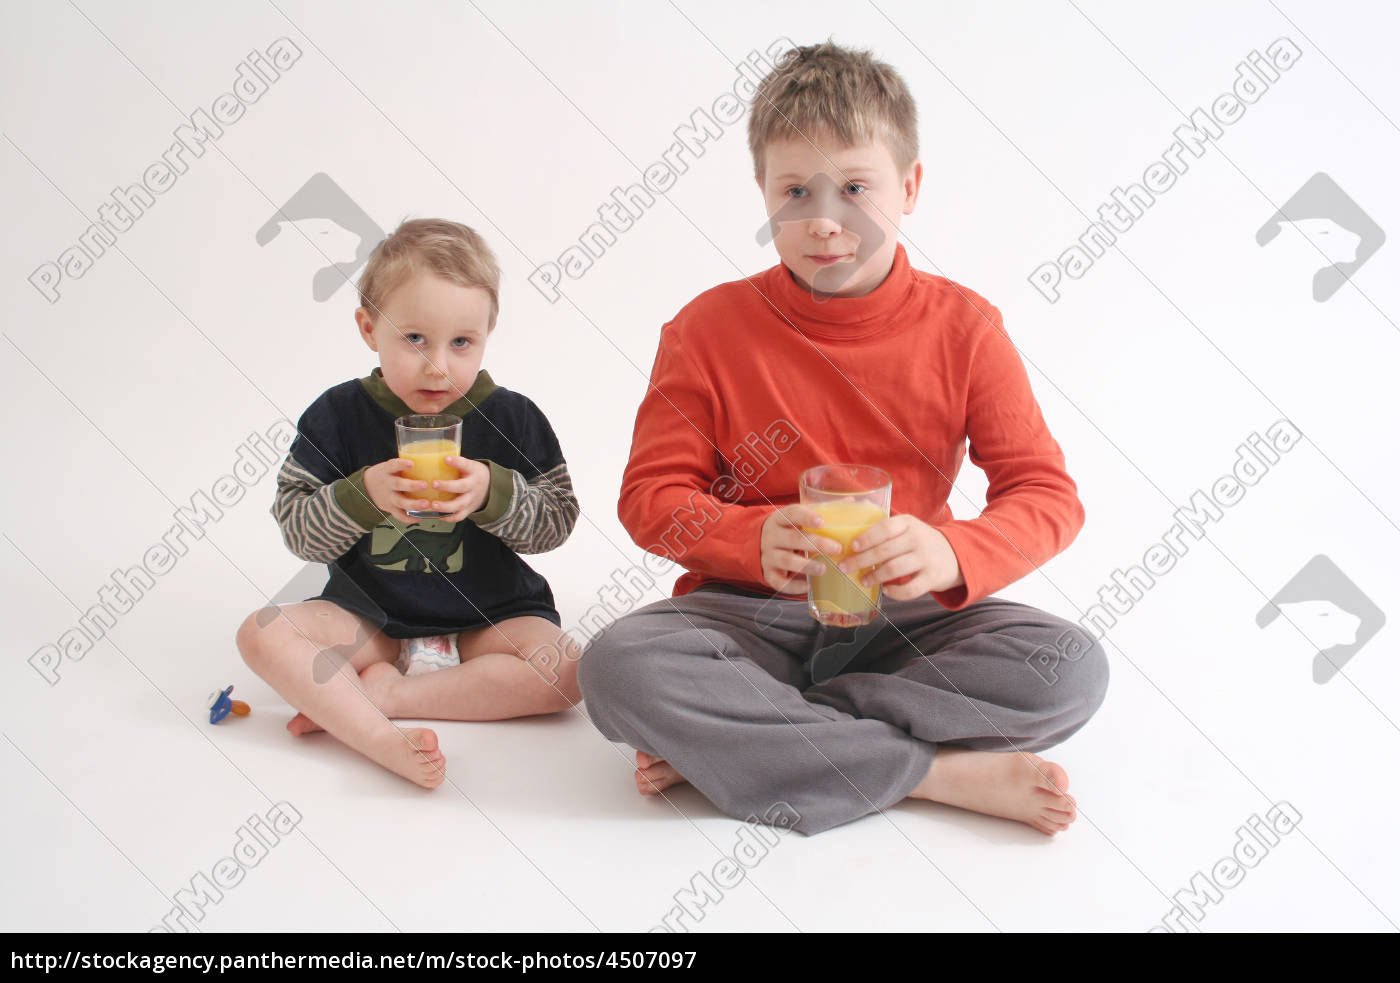 beber, jugo - 4507097